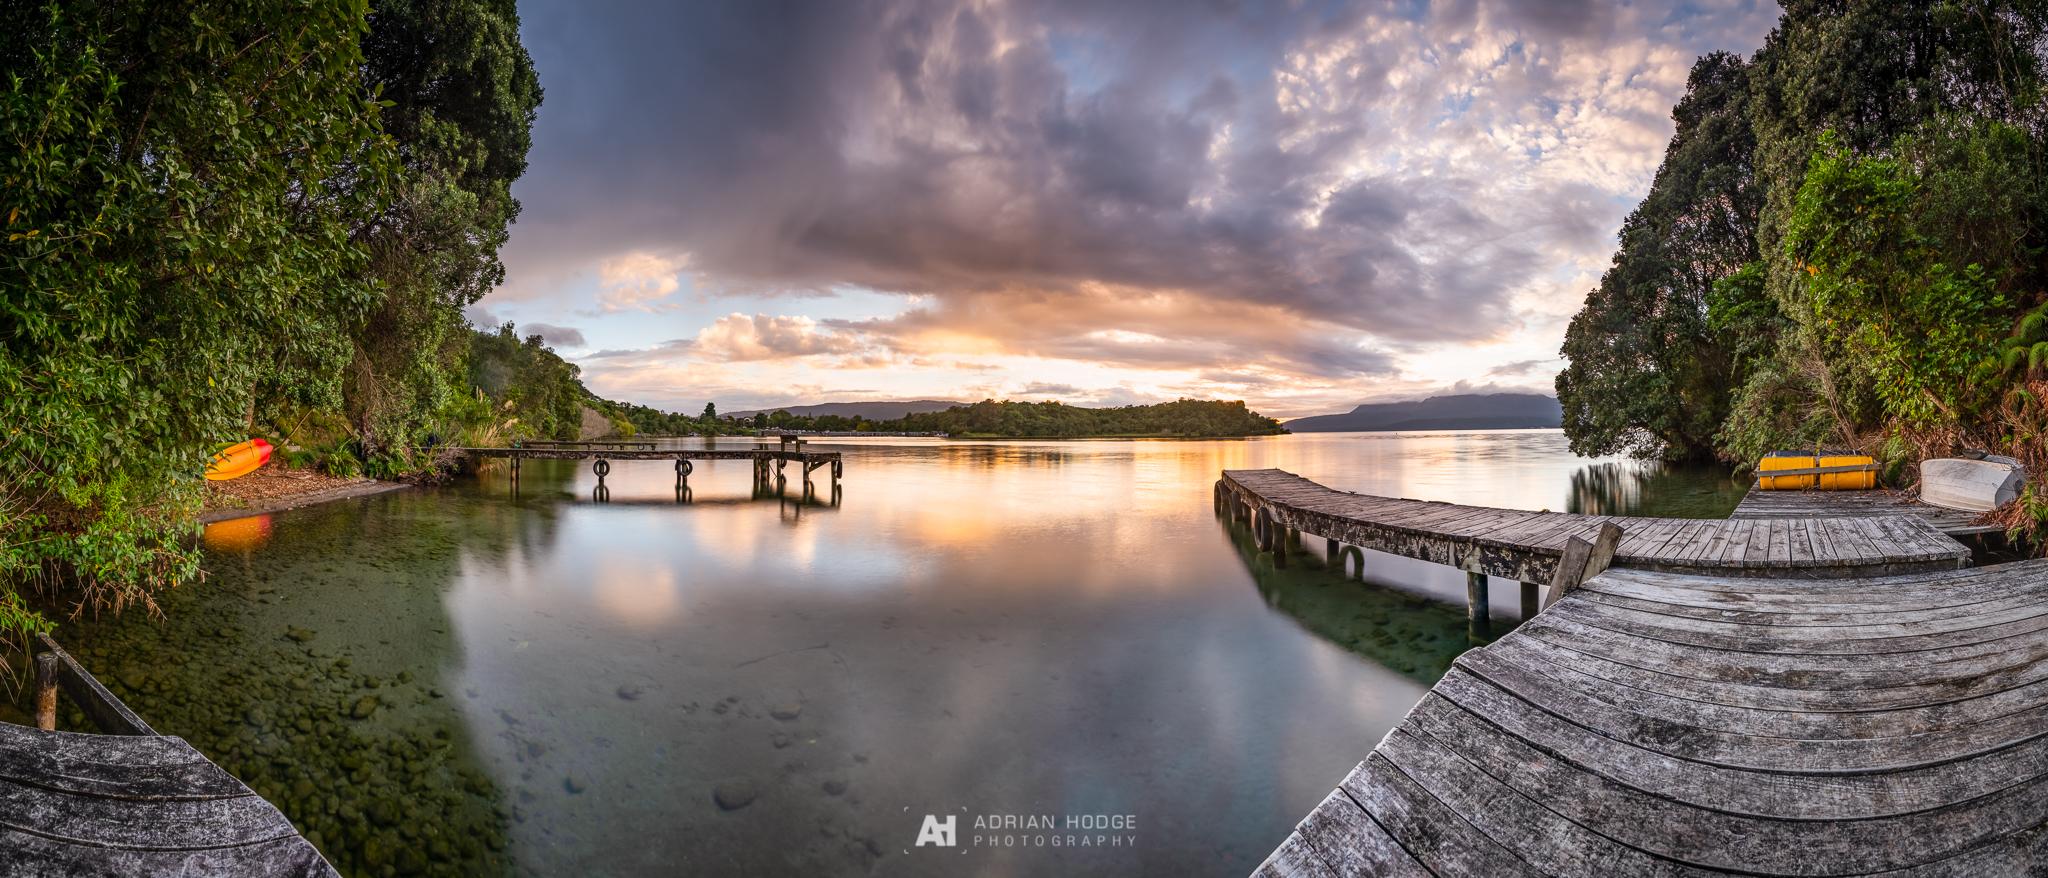 A 6 frame stitched panorama of sunrise from Kariri Point on Lake Tarawera, Rotorua